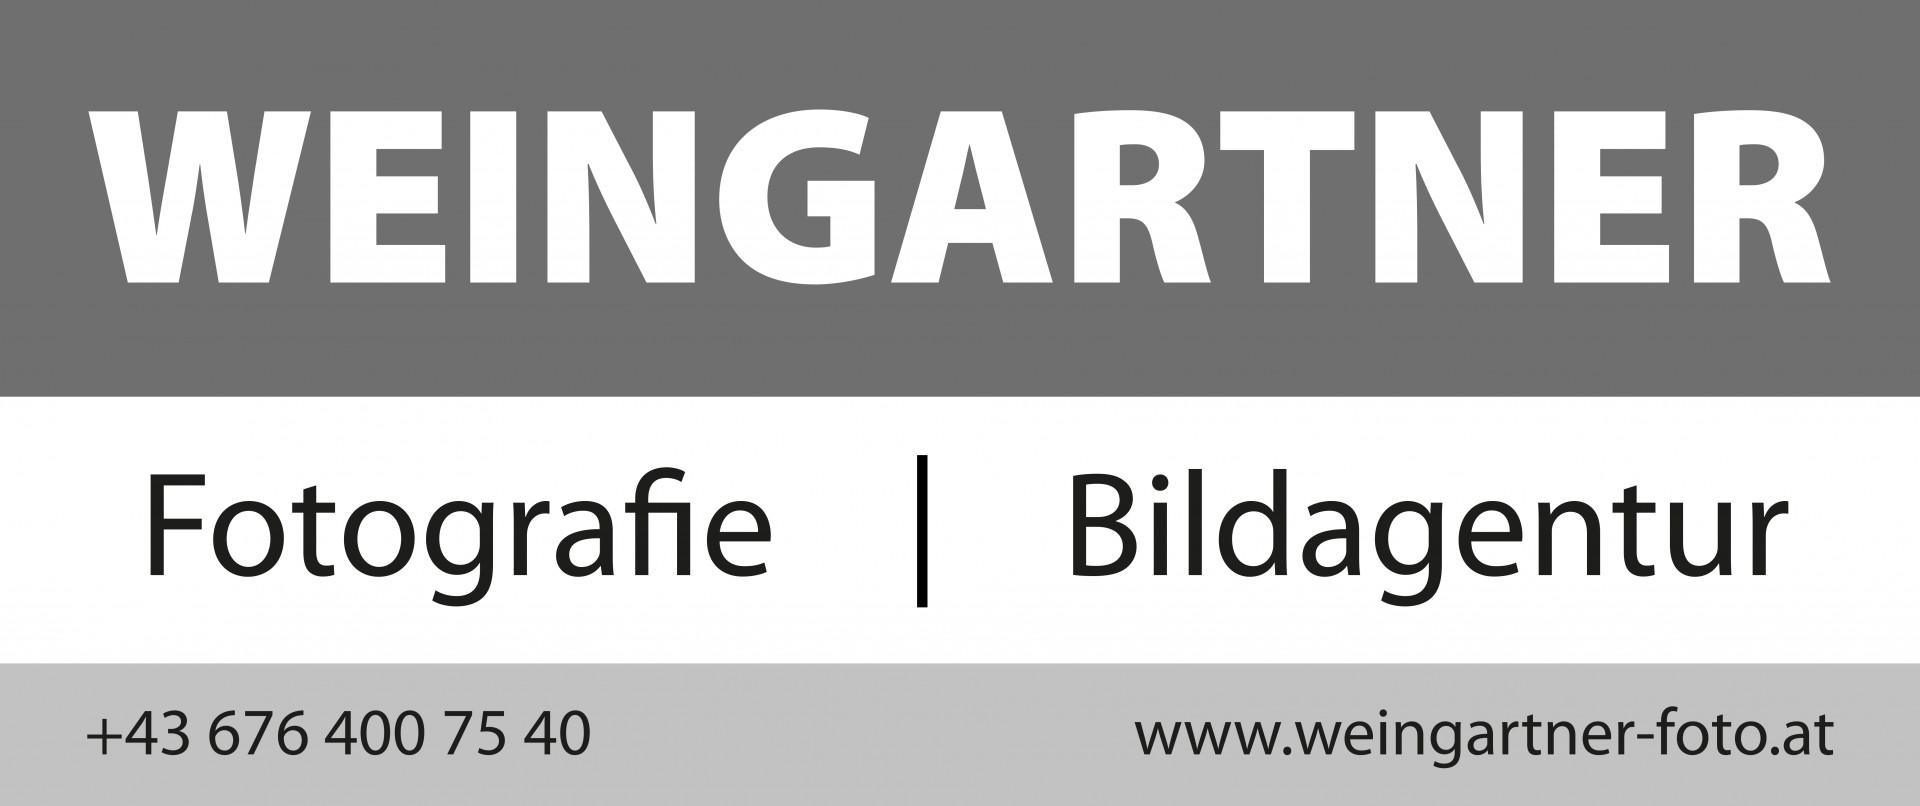 Weingartner-Foto